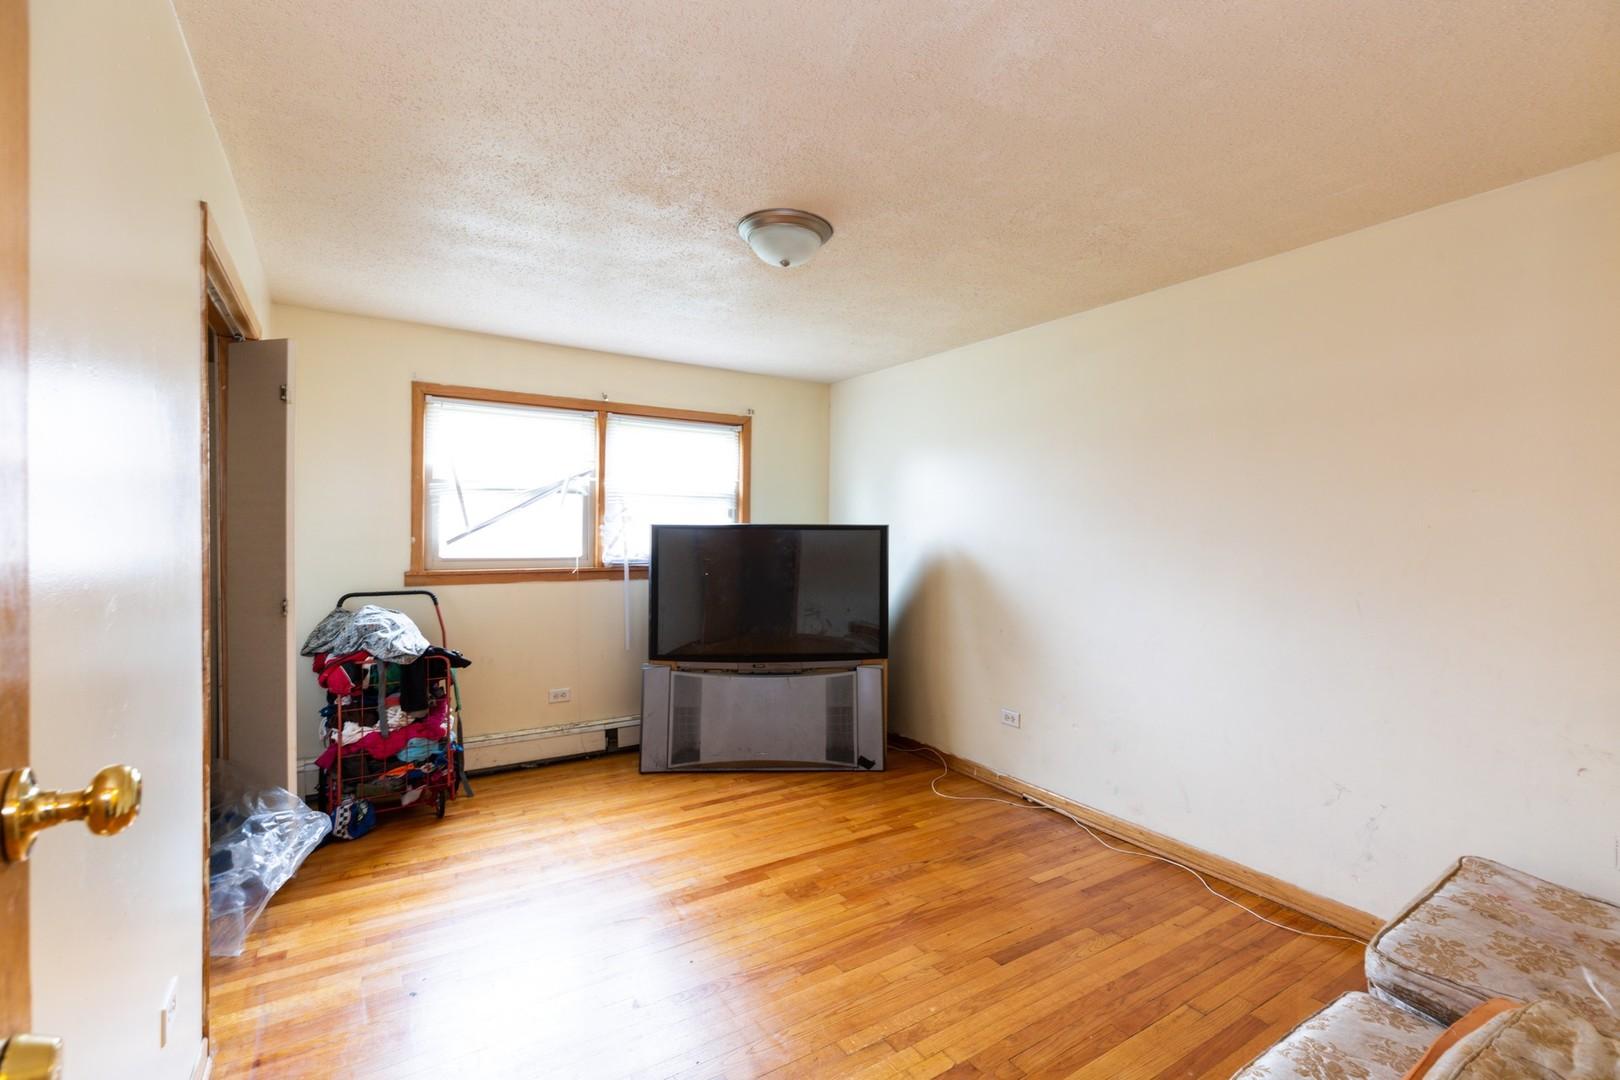 303 CRANDON, Calumet City, Illinois, 60409